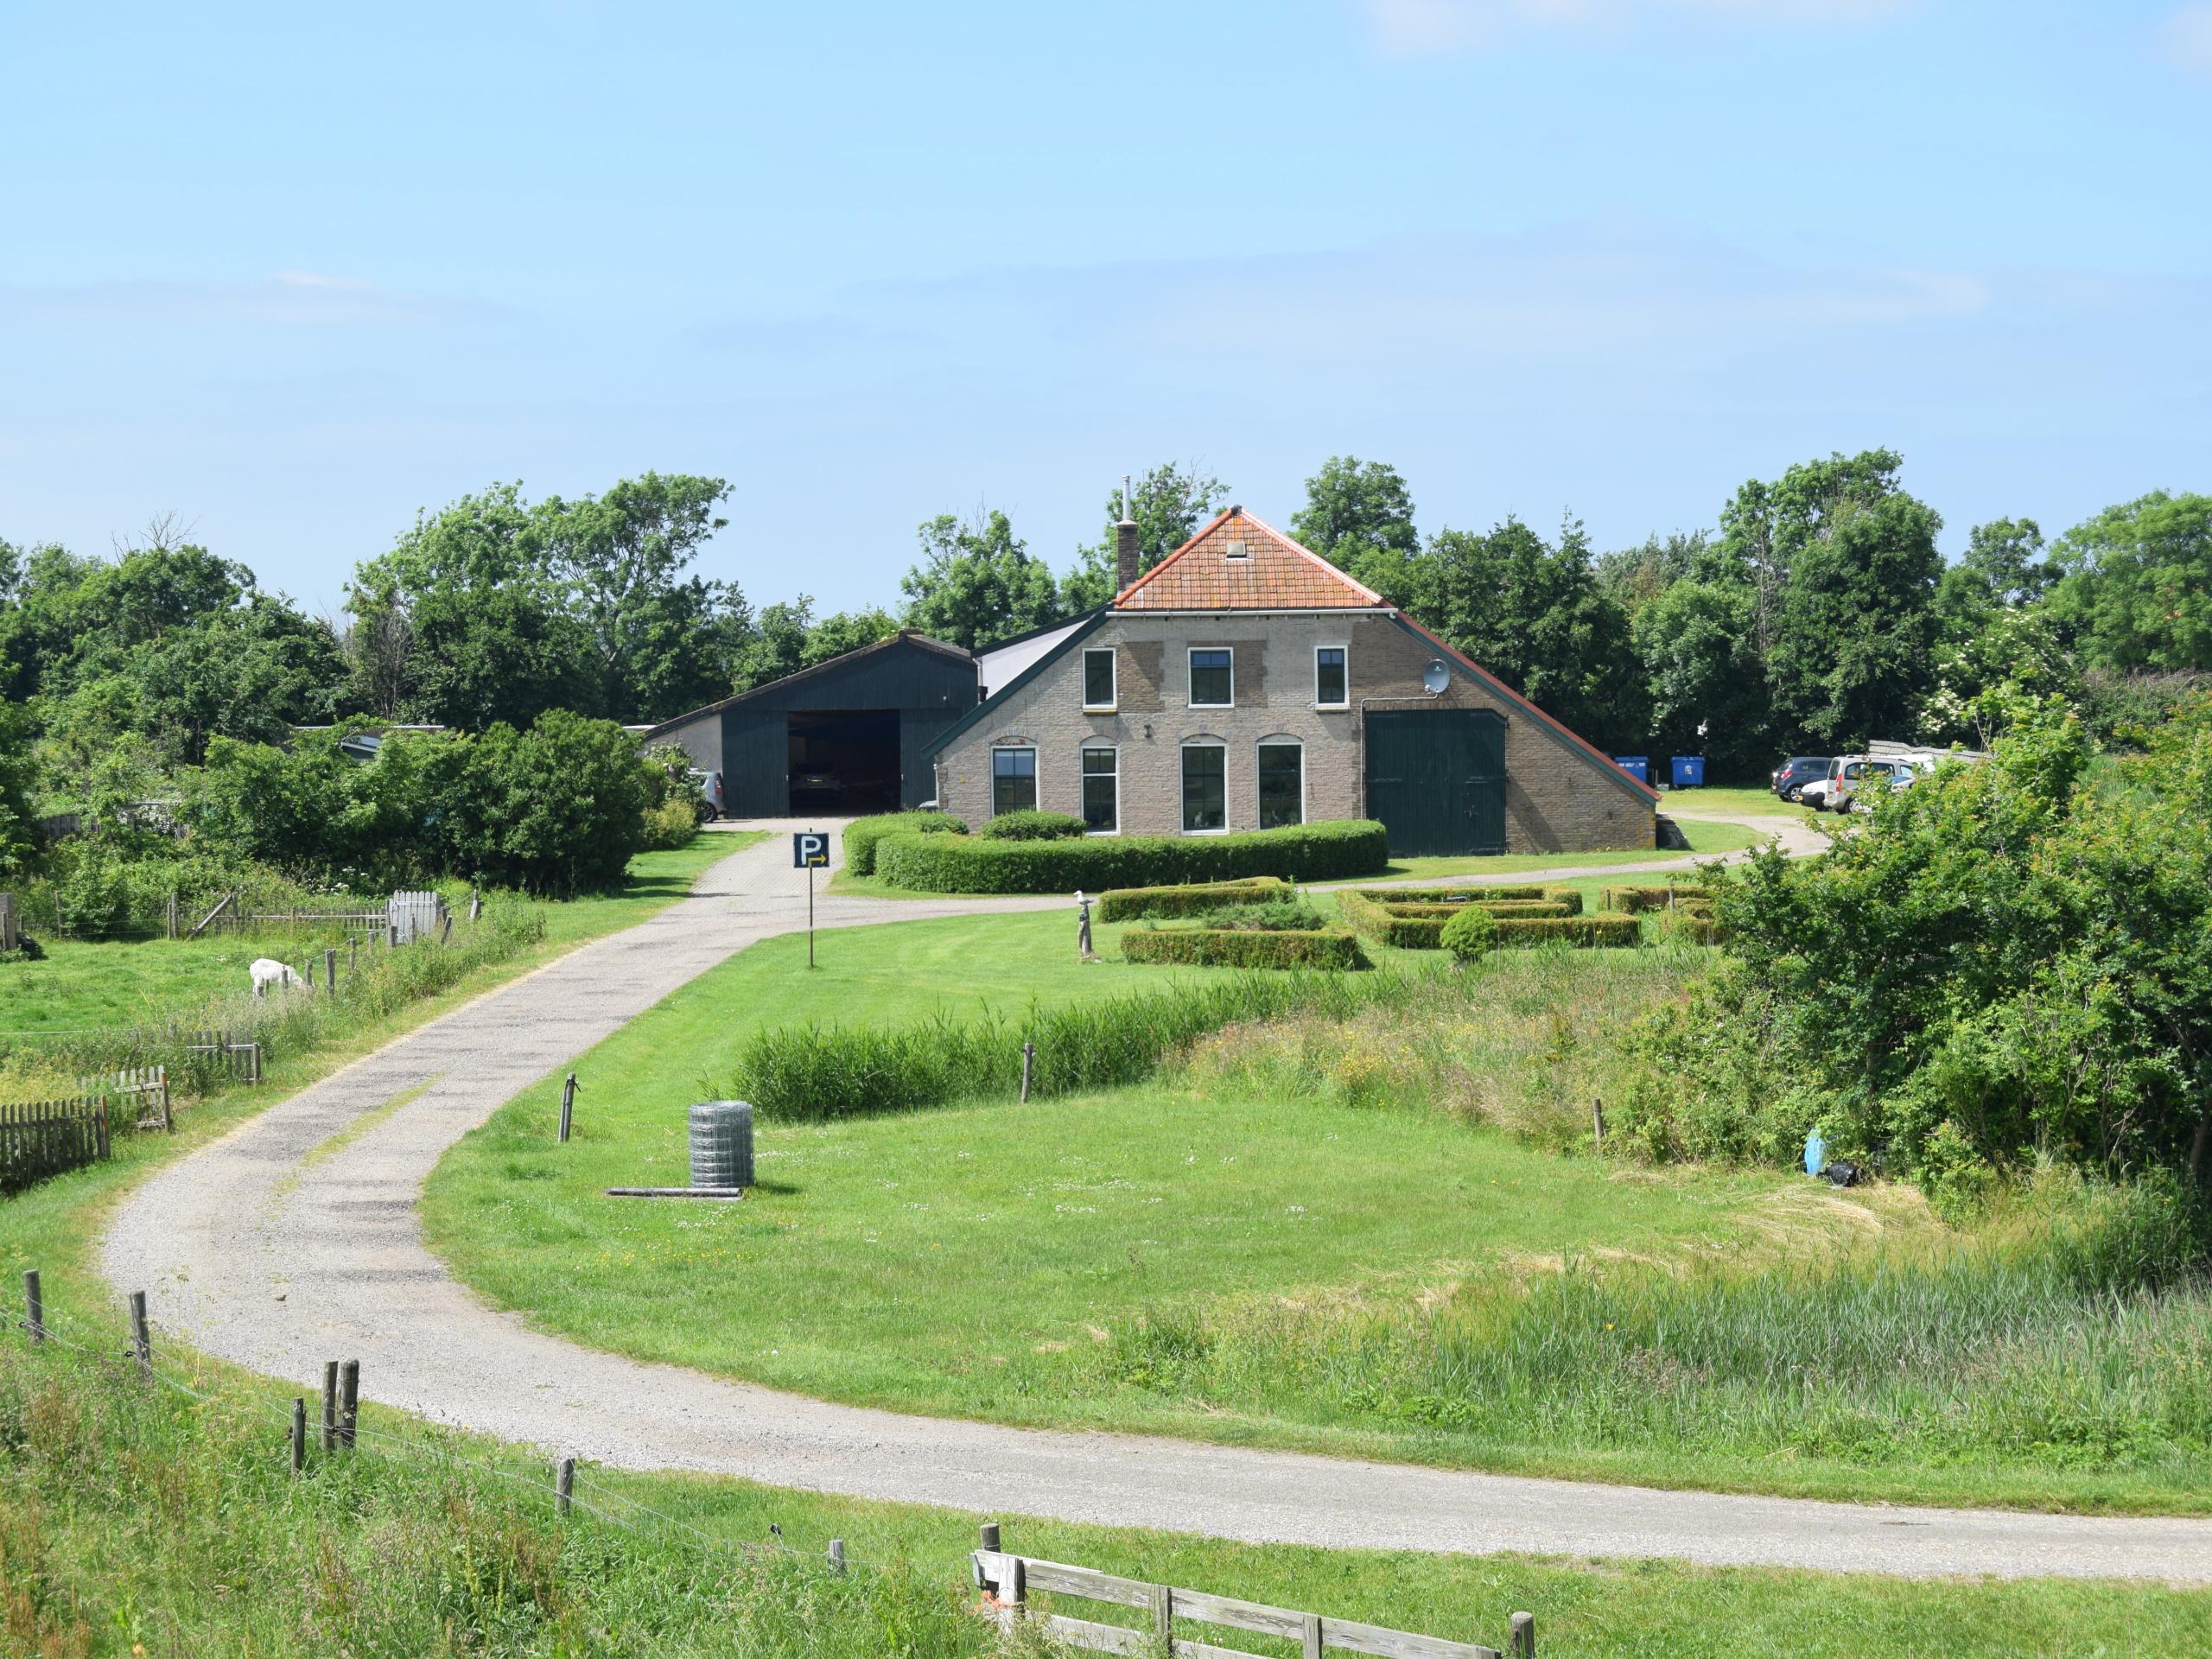 Rural campsite near Waddenzee and Oudeschild